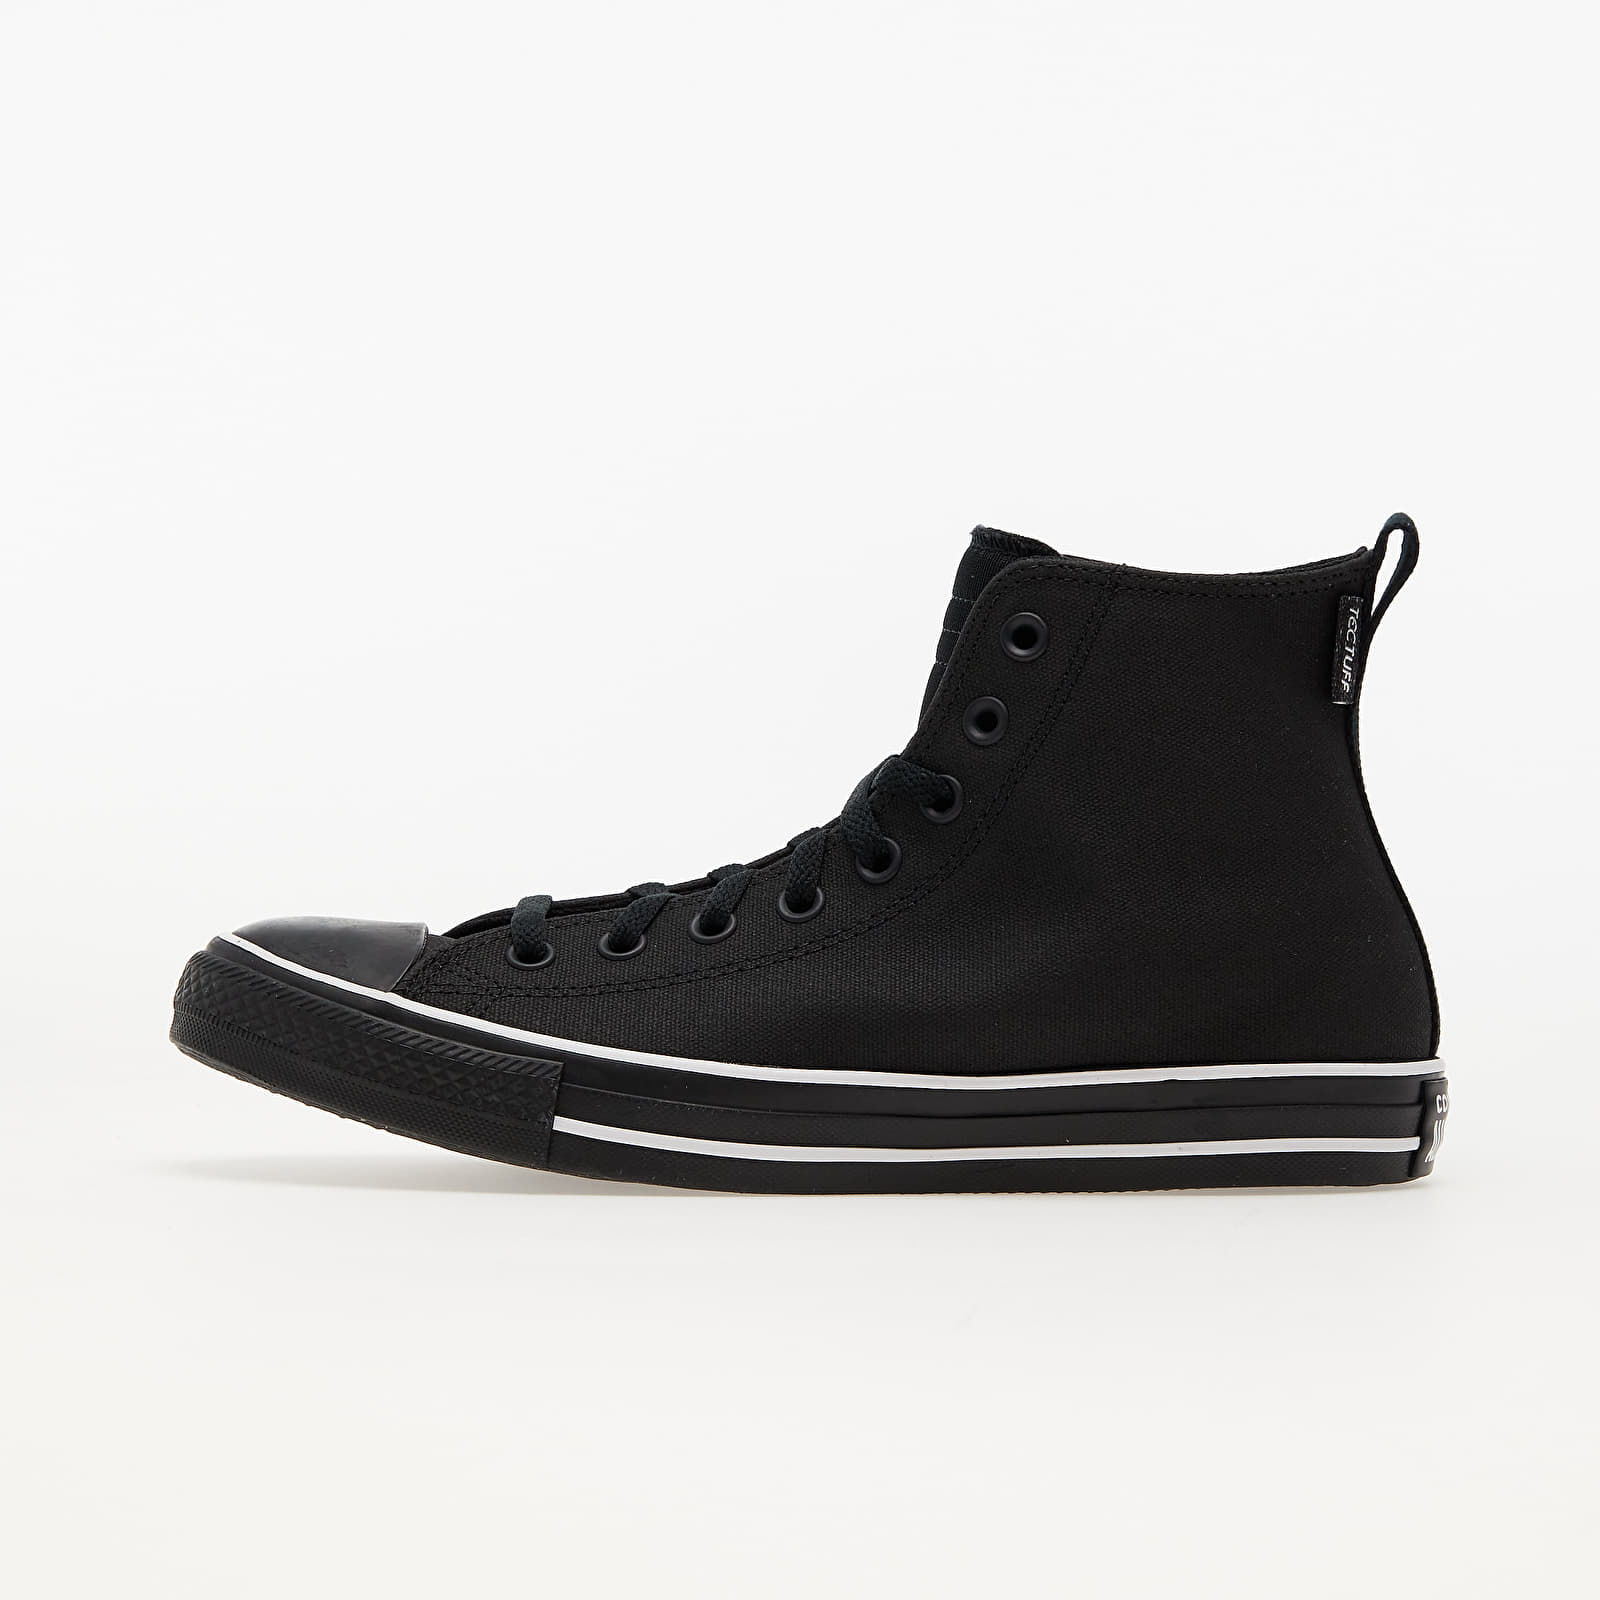 Converse Chuck Taylor All Star Black/ Black/ White EUR 43